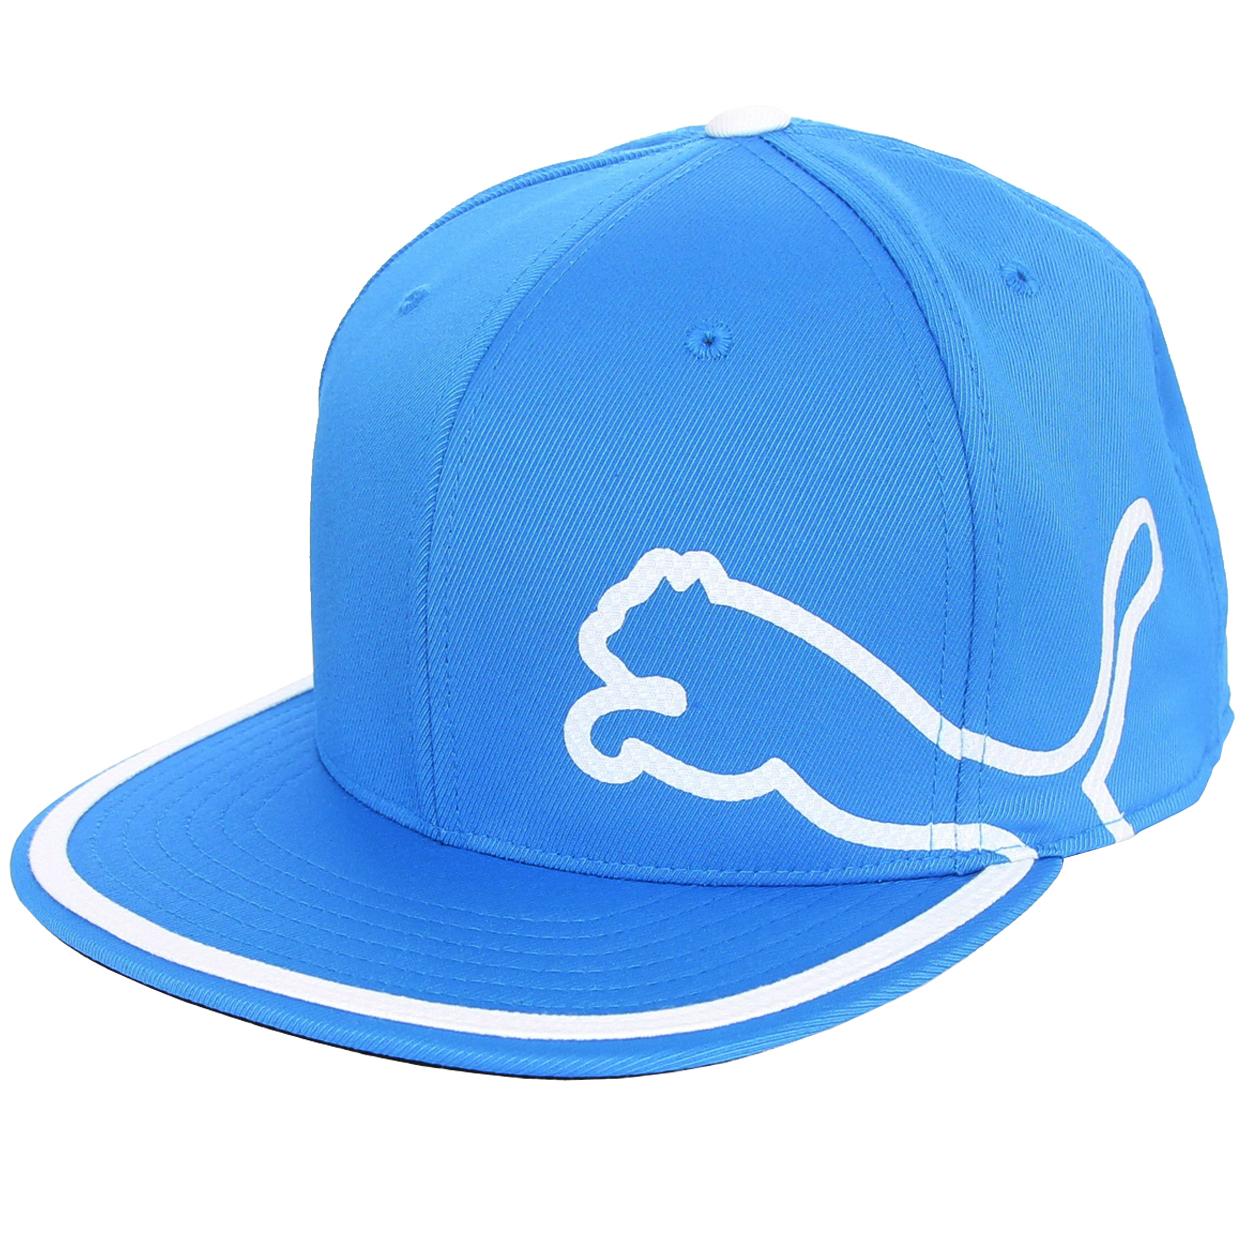 b611e138284 ... best price puma pro tour performance monoline 110 golf hat blue white  ebay d556d 305ef